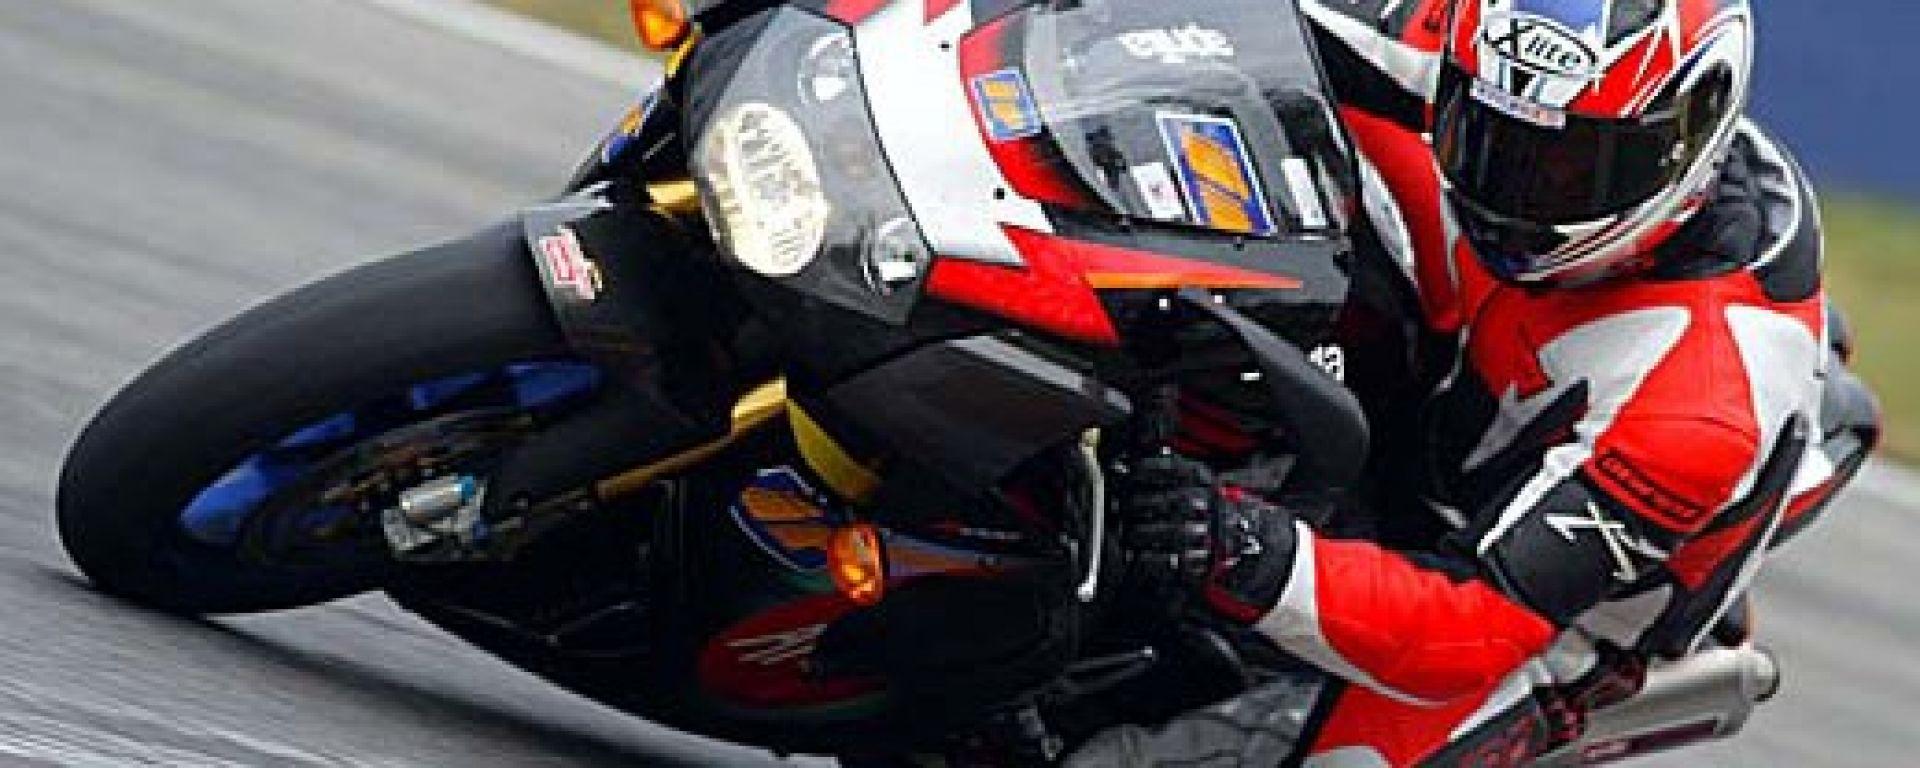 Aprilia RSV Mille R Edwards